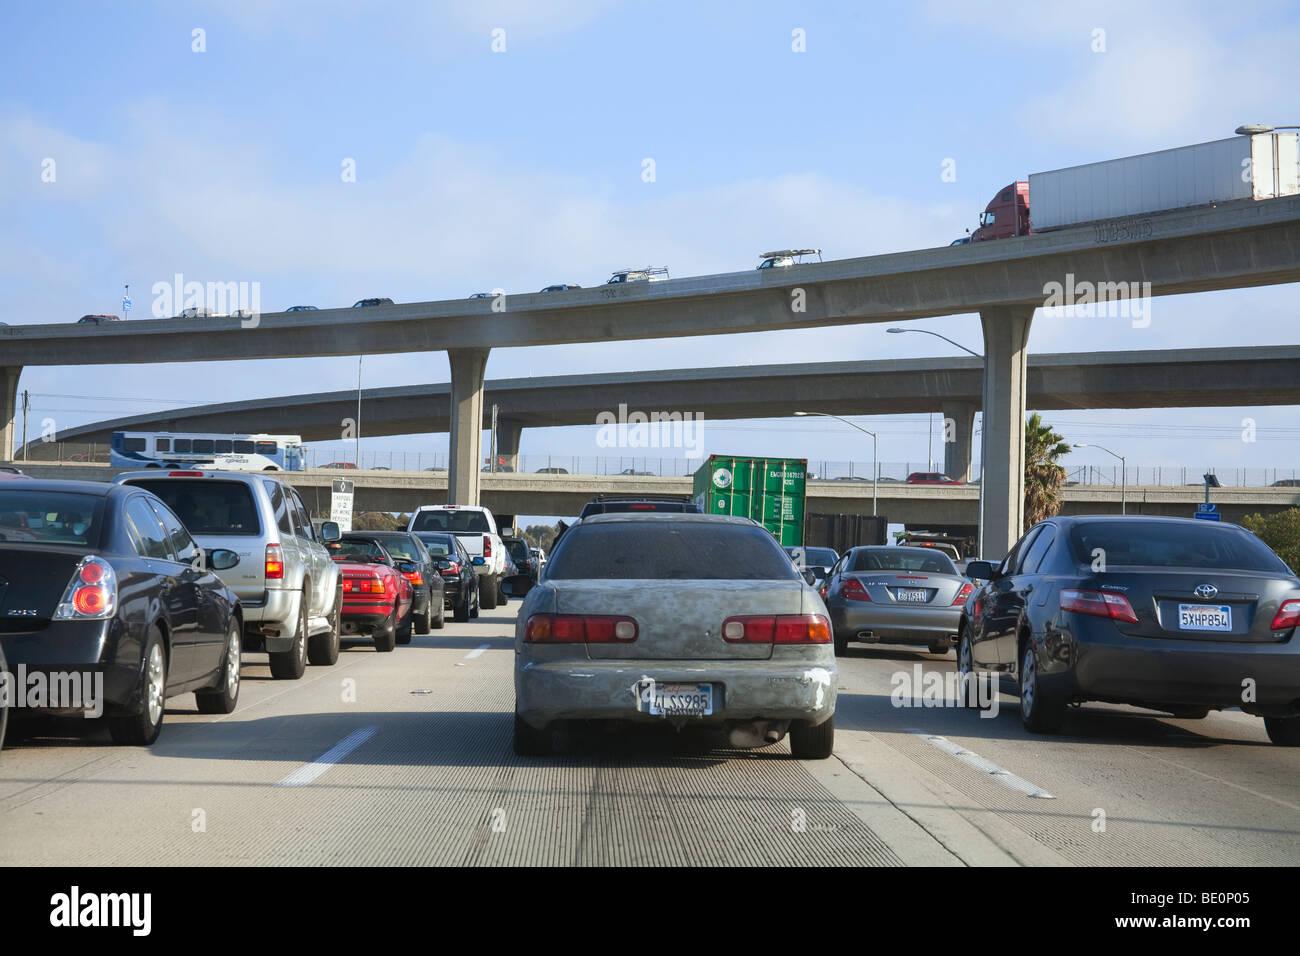 Traffic on the 405 Freeway, Los Angeles, California, USA - Stock Image